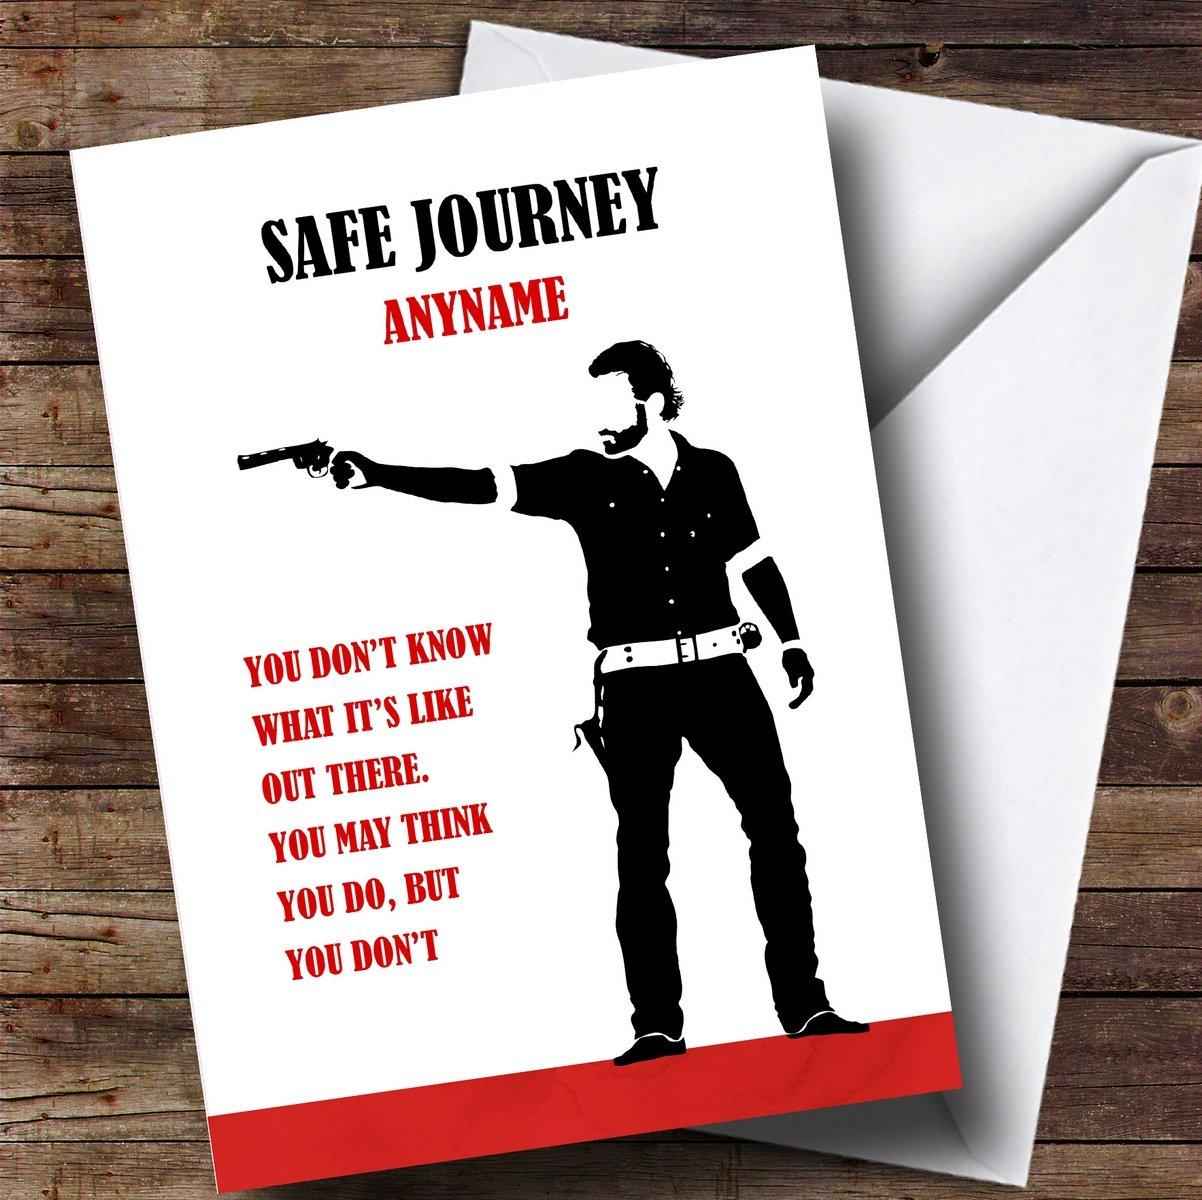 Amazon.com : Personalized Safe Journey Walking Dead Rick Quote Bon ...